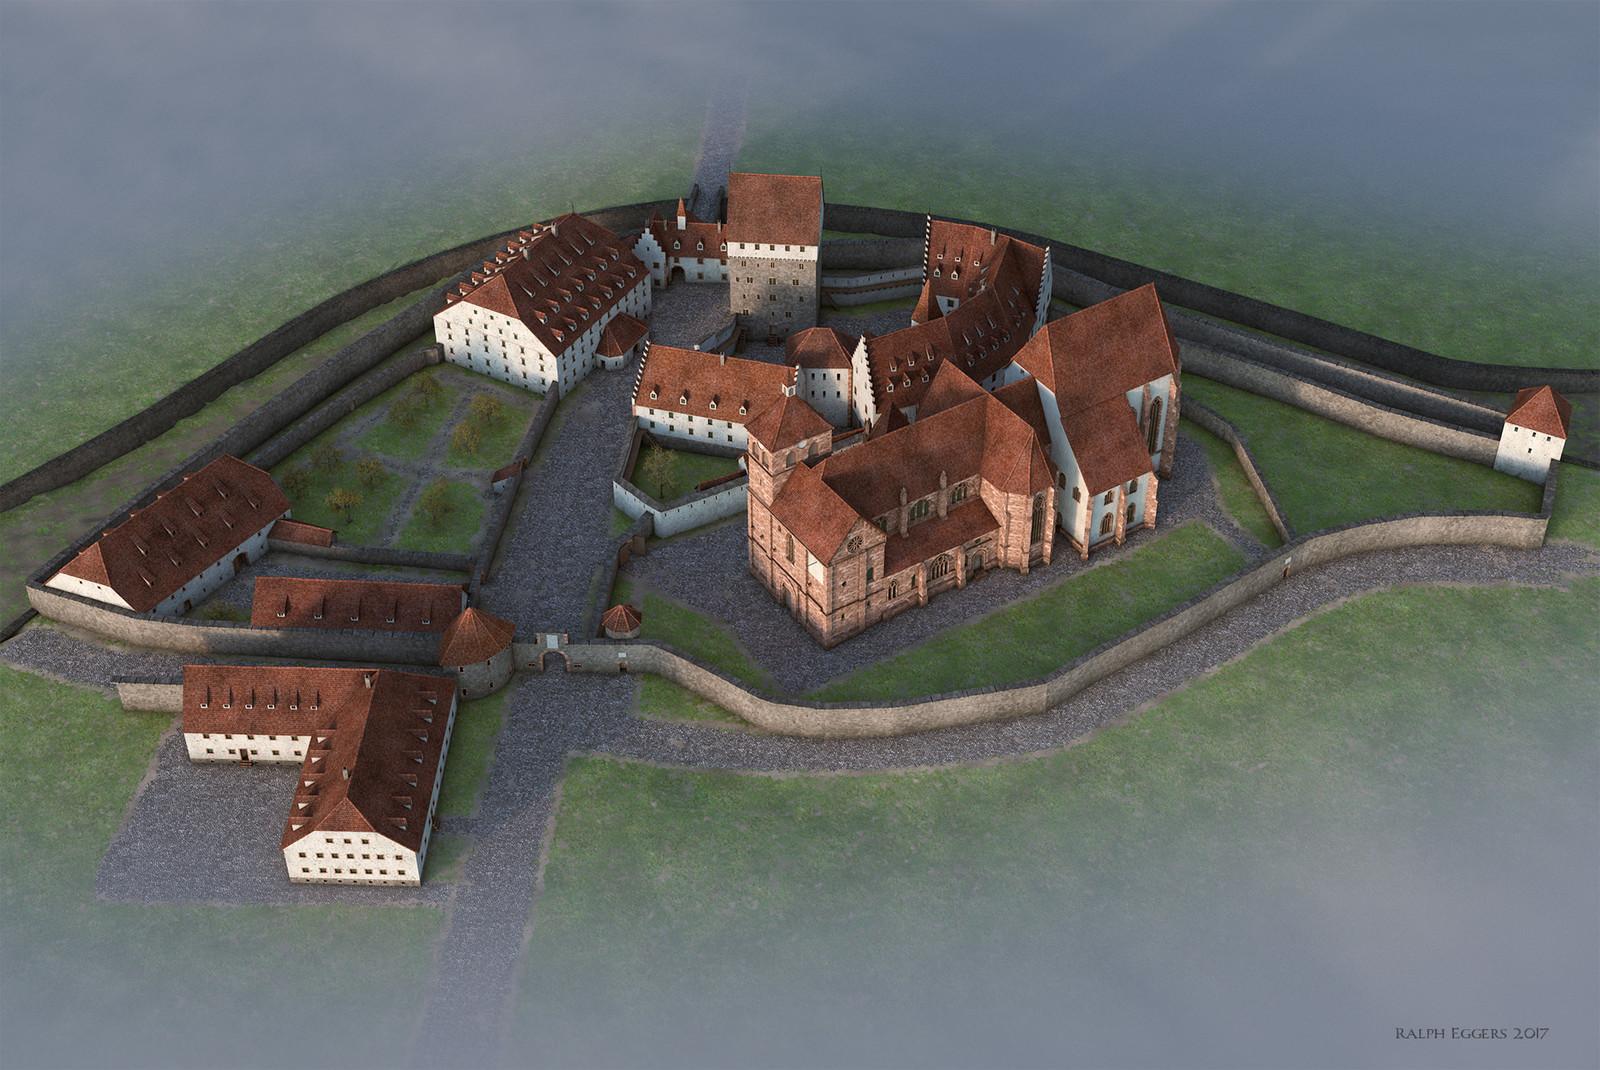 Reconstruction of Pforzheim residence